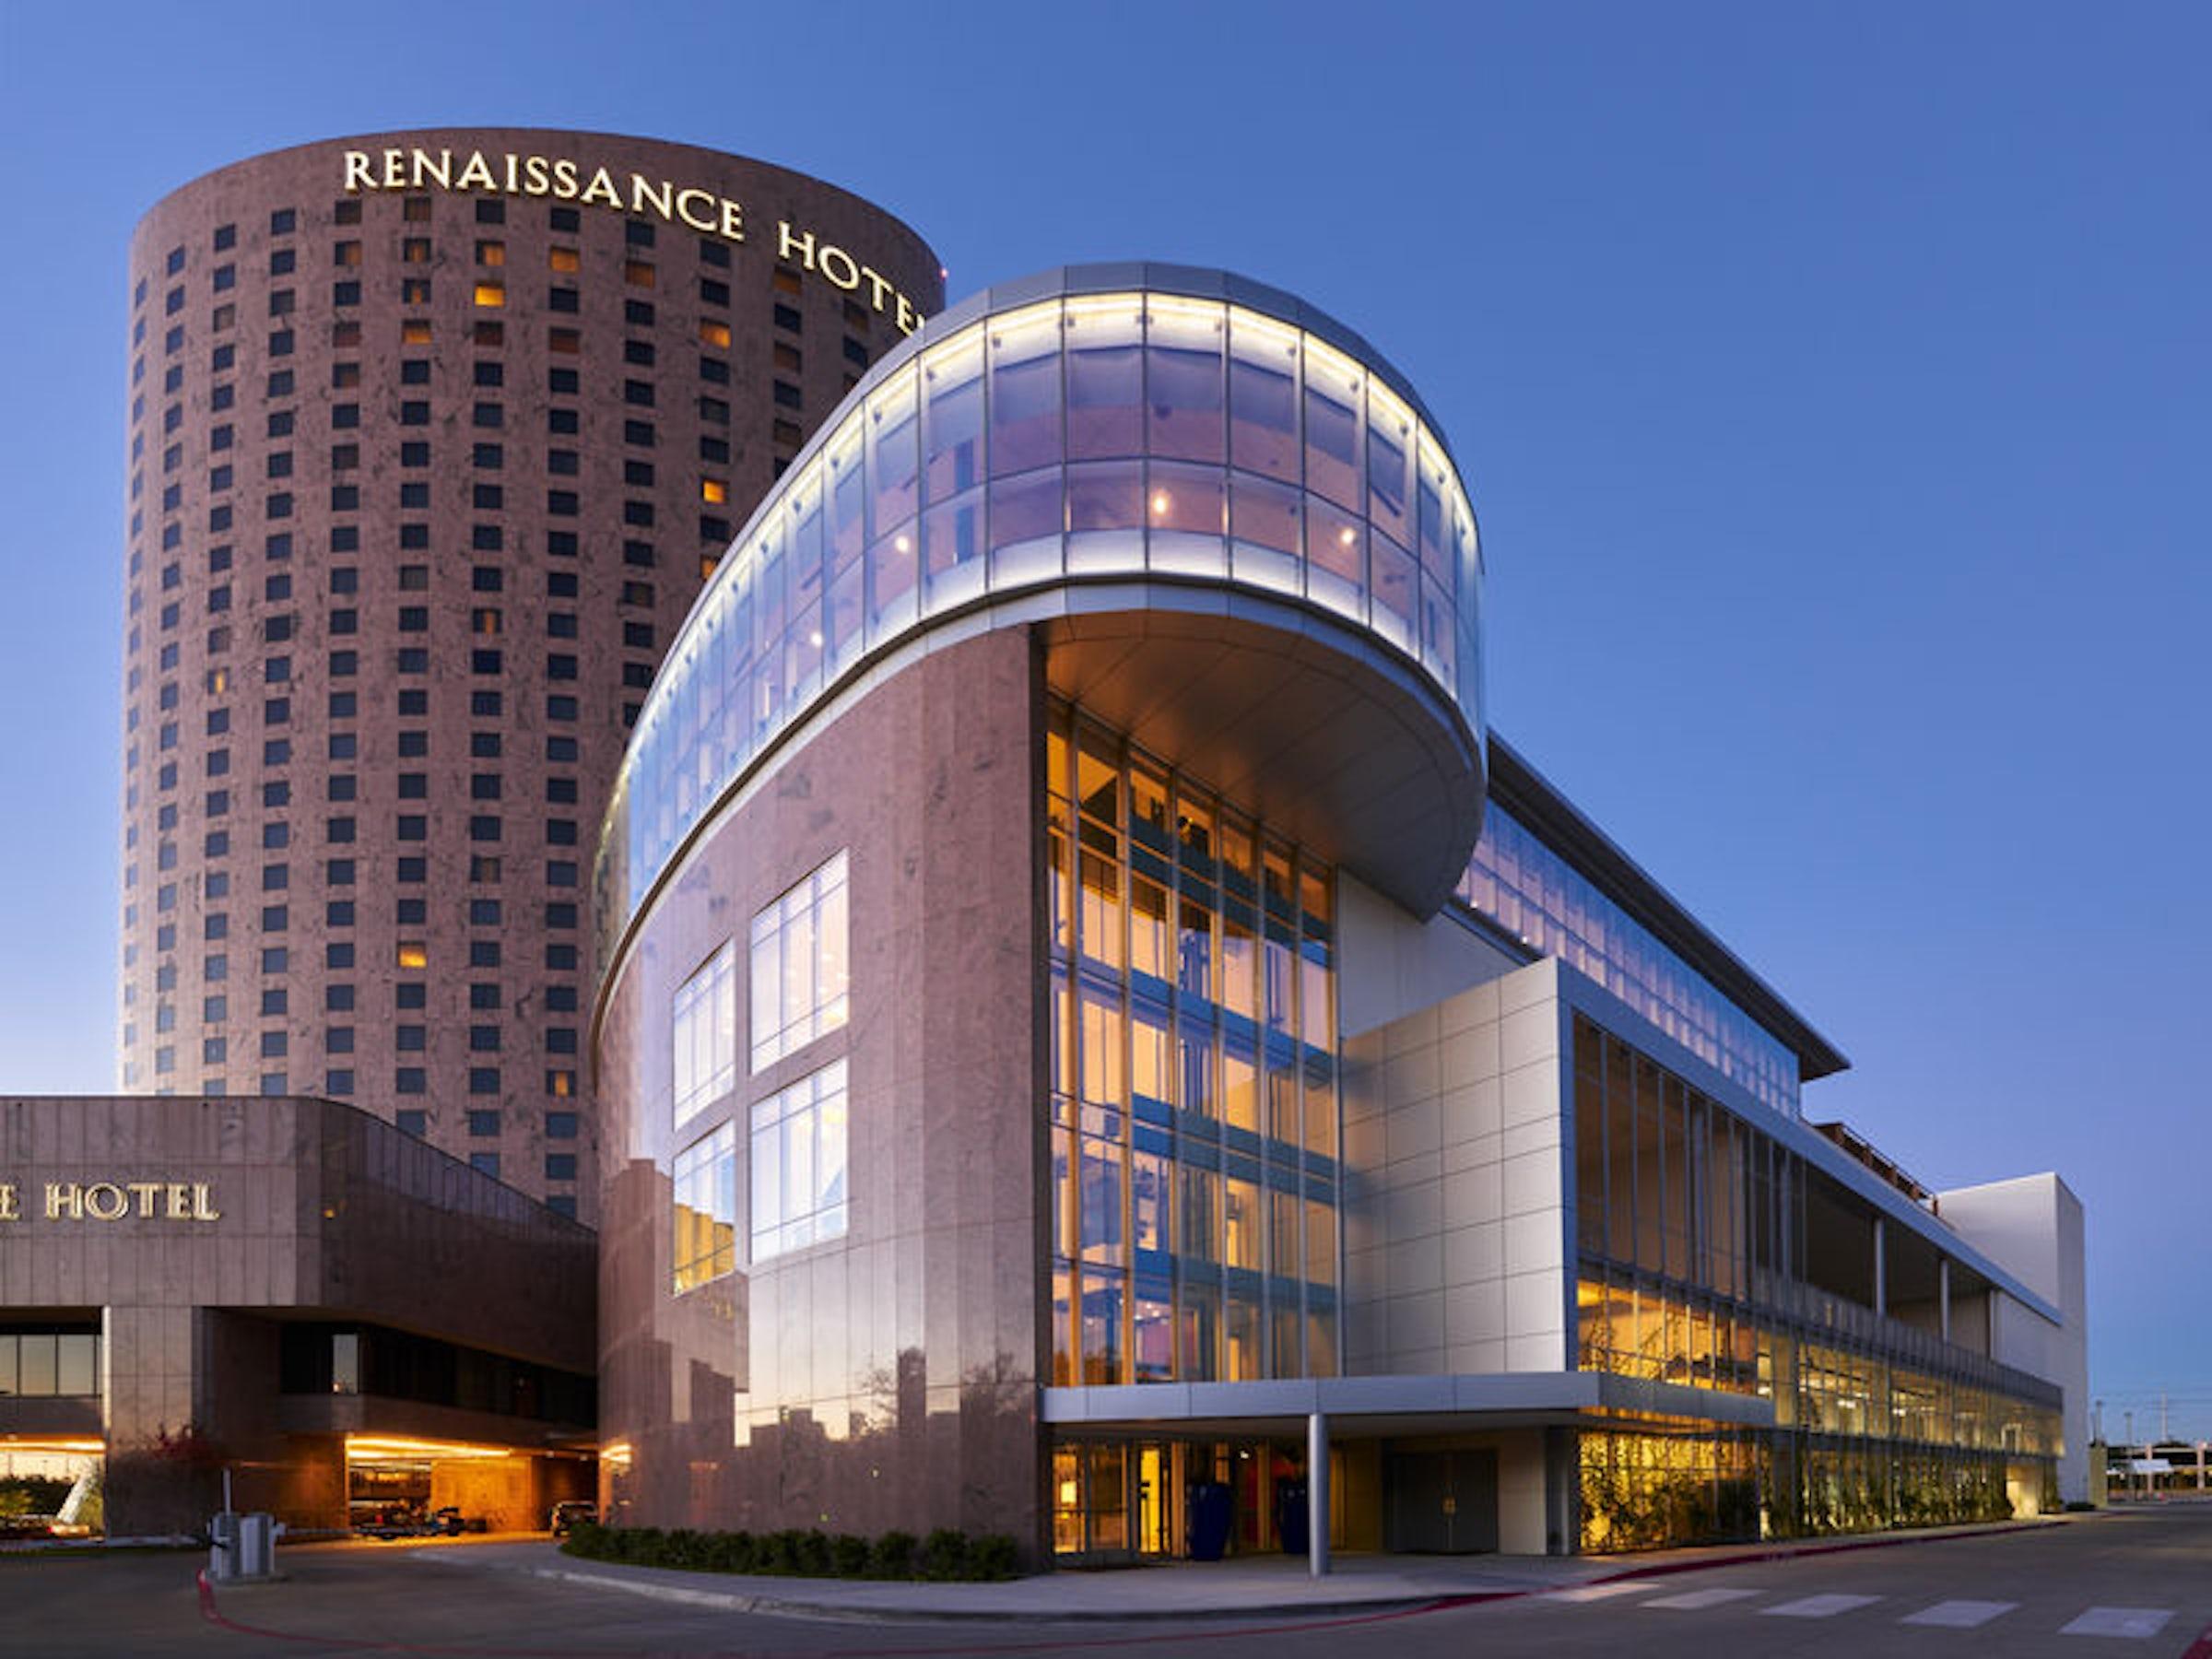 Renaissance Dallas Hotel in Beyond Dallas